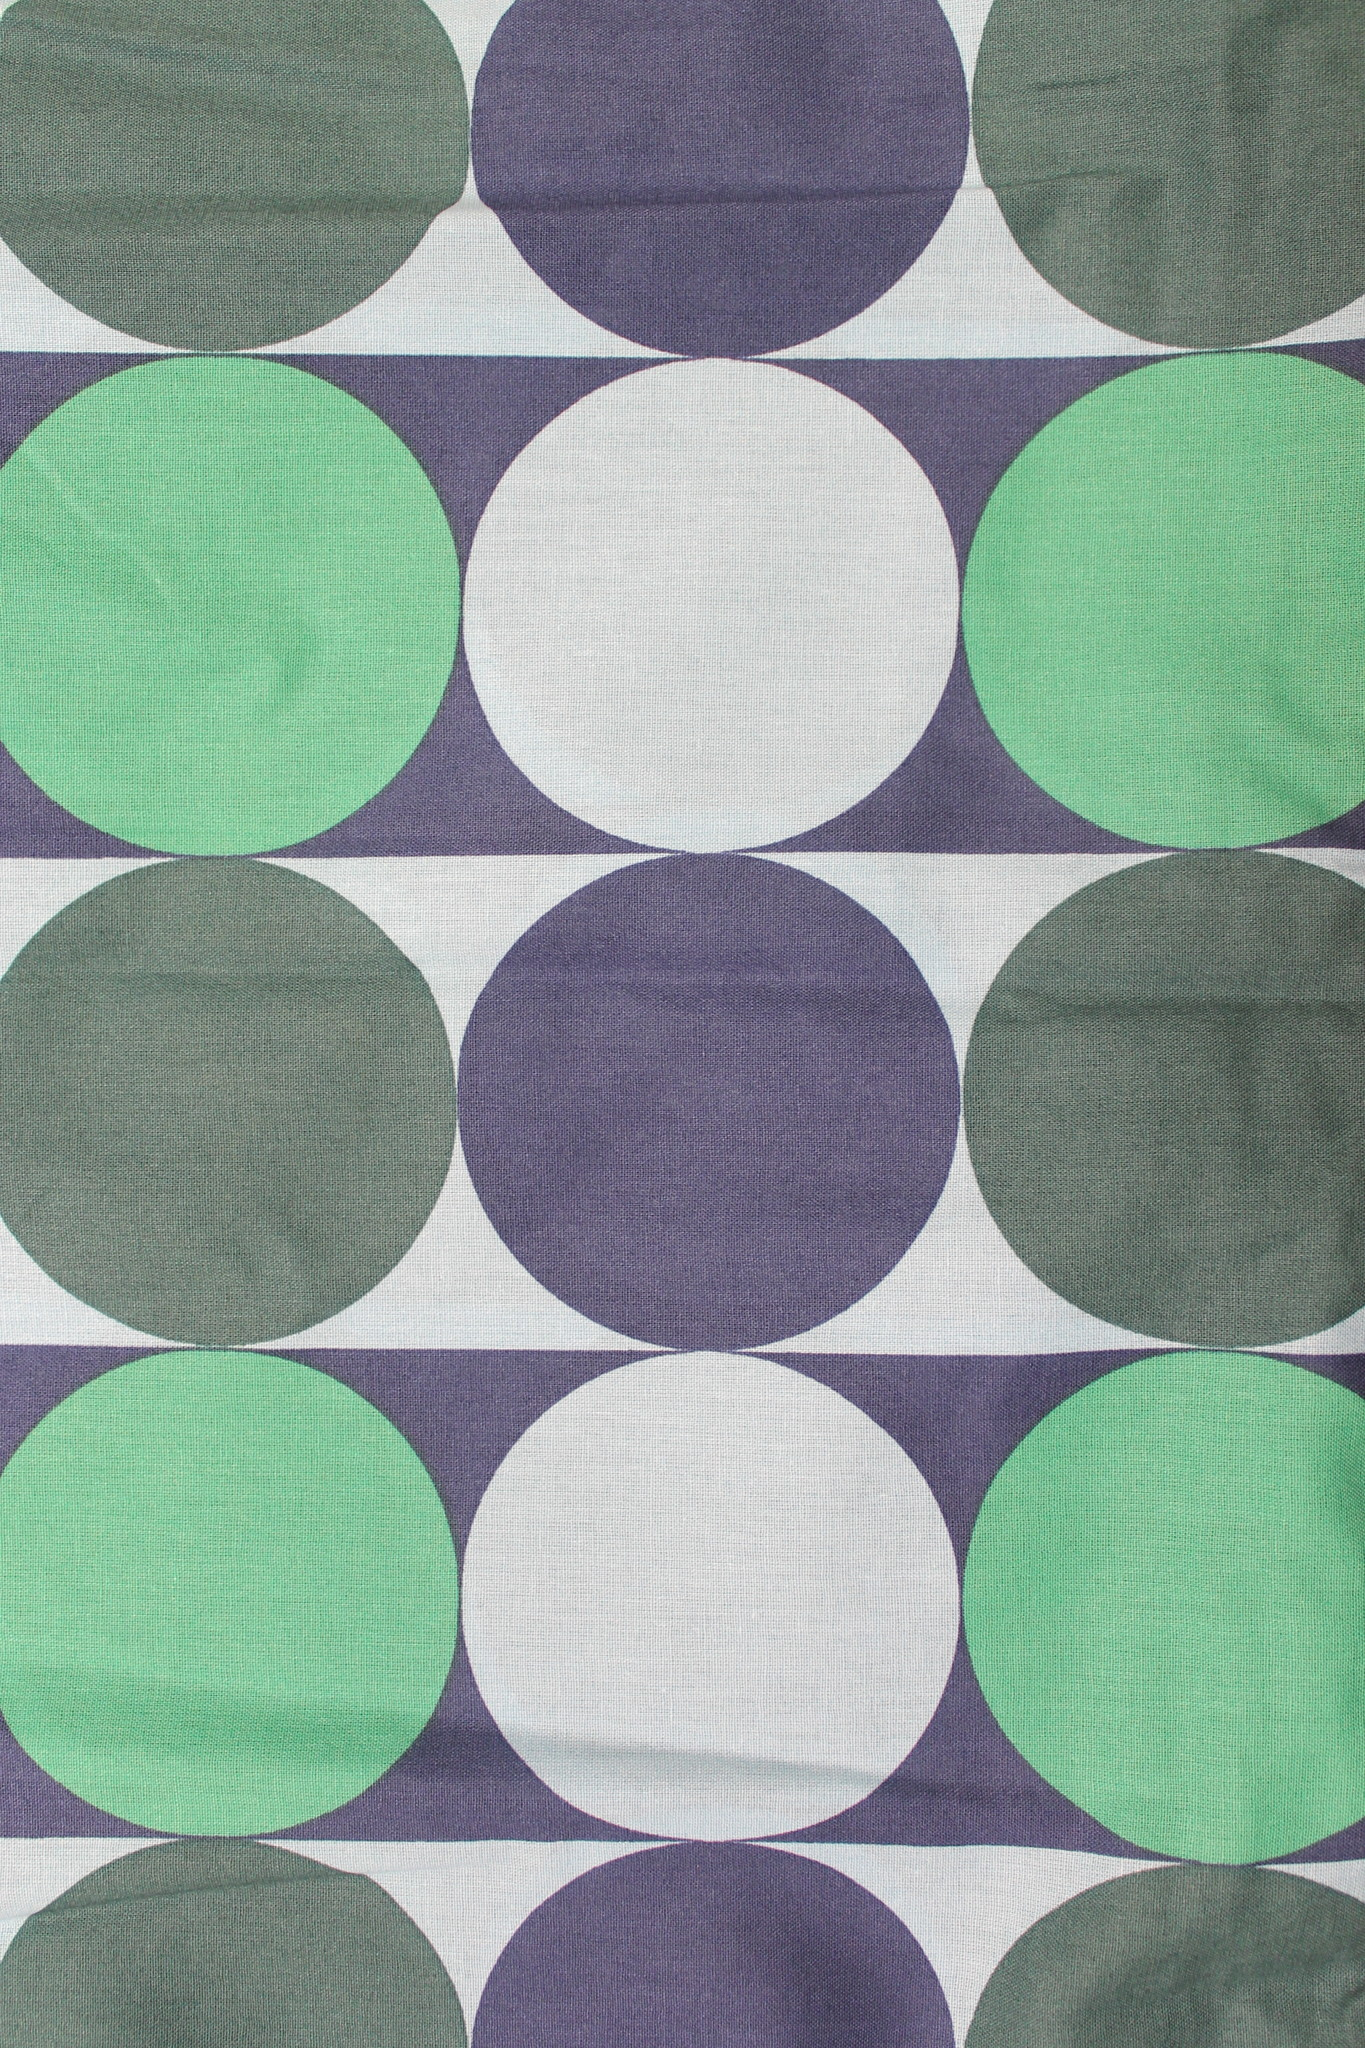 Dorm Package - 3 - Polka dot print